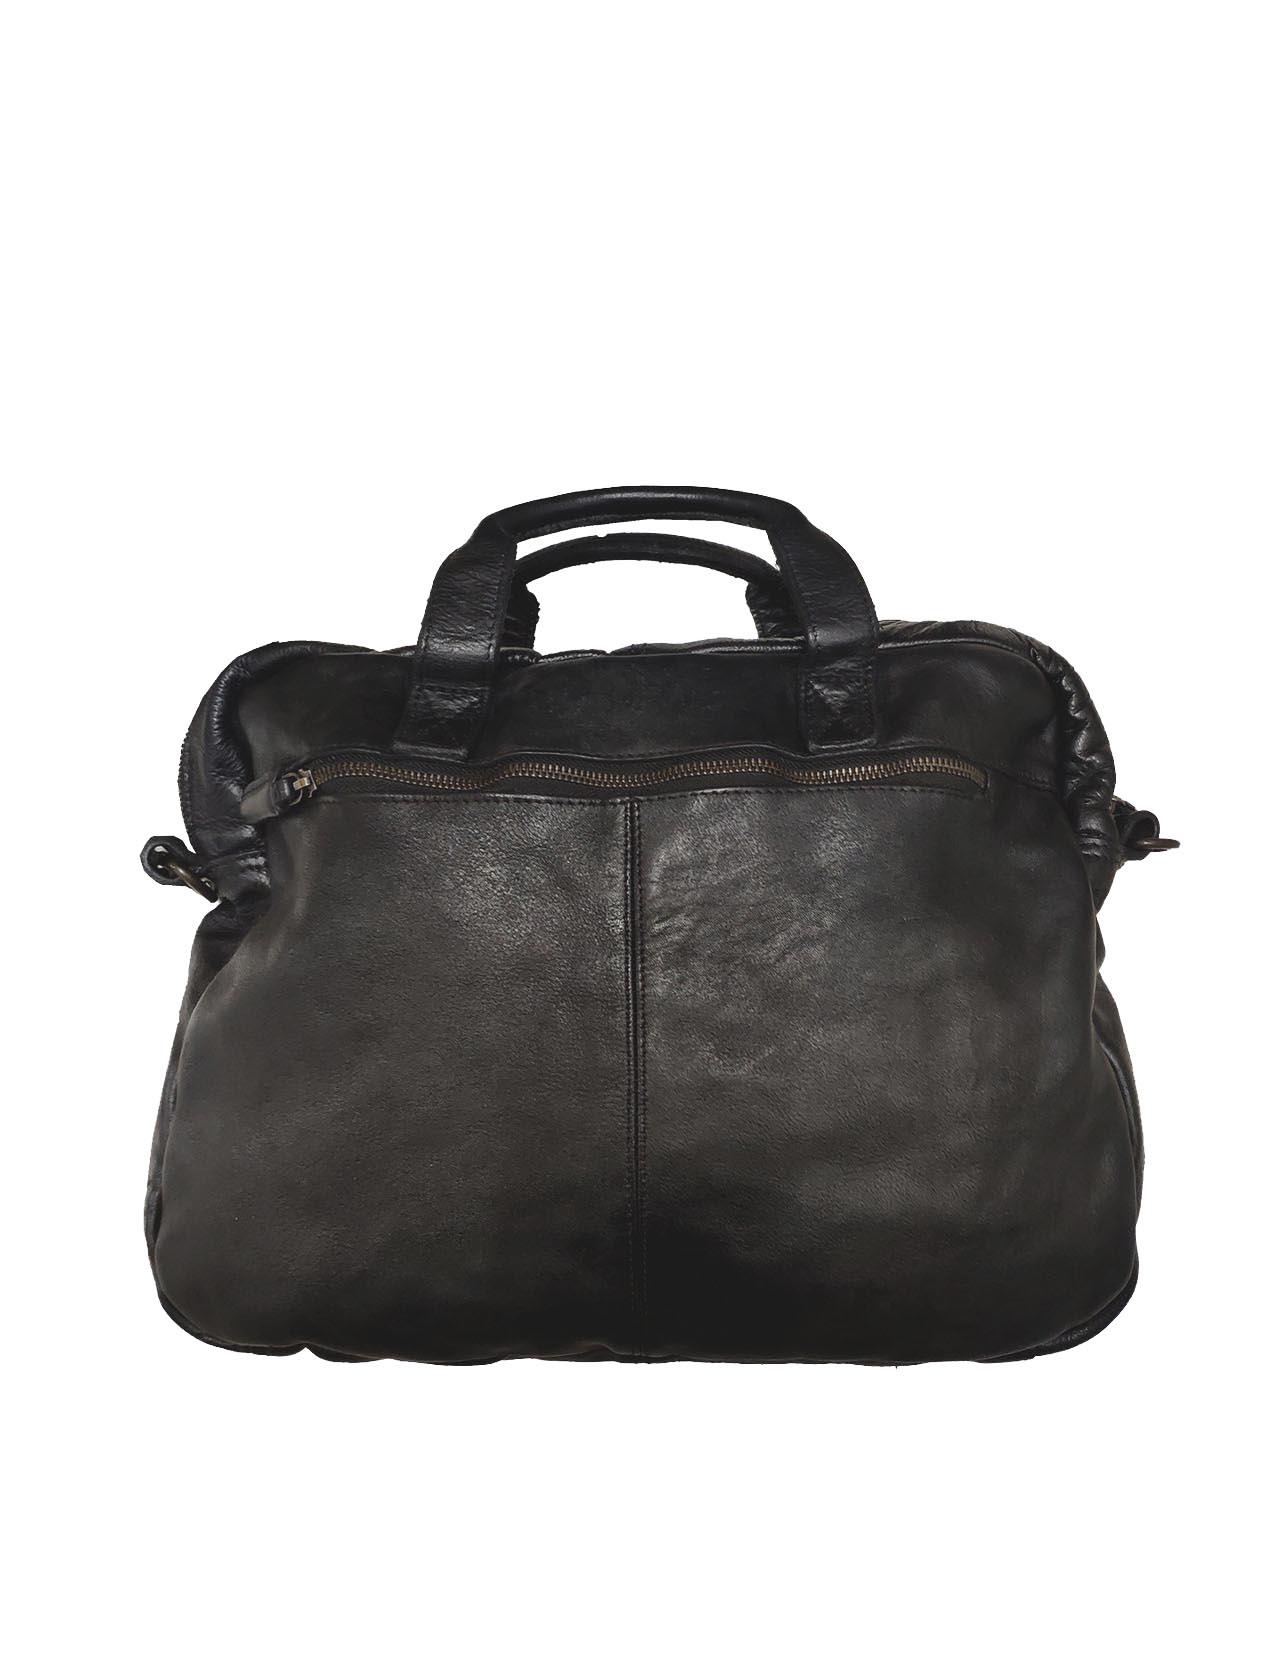 Minoronzoni | Bags and backpacks | MRF194B112C99